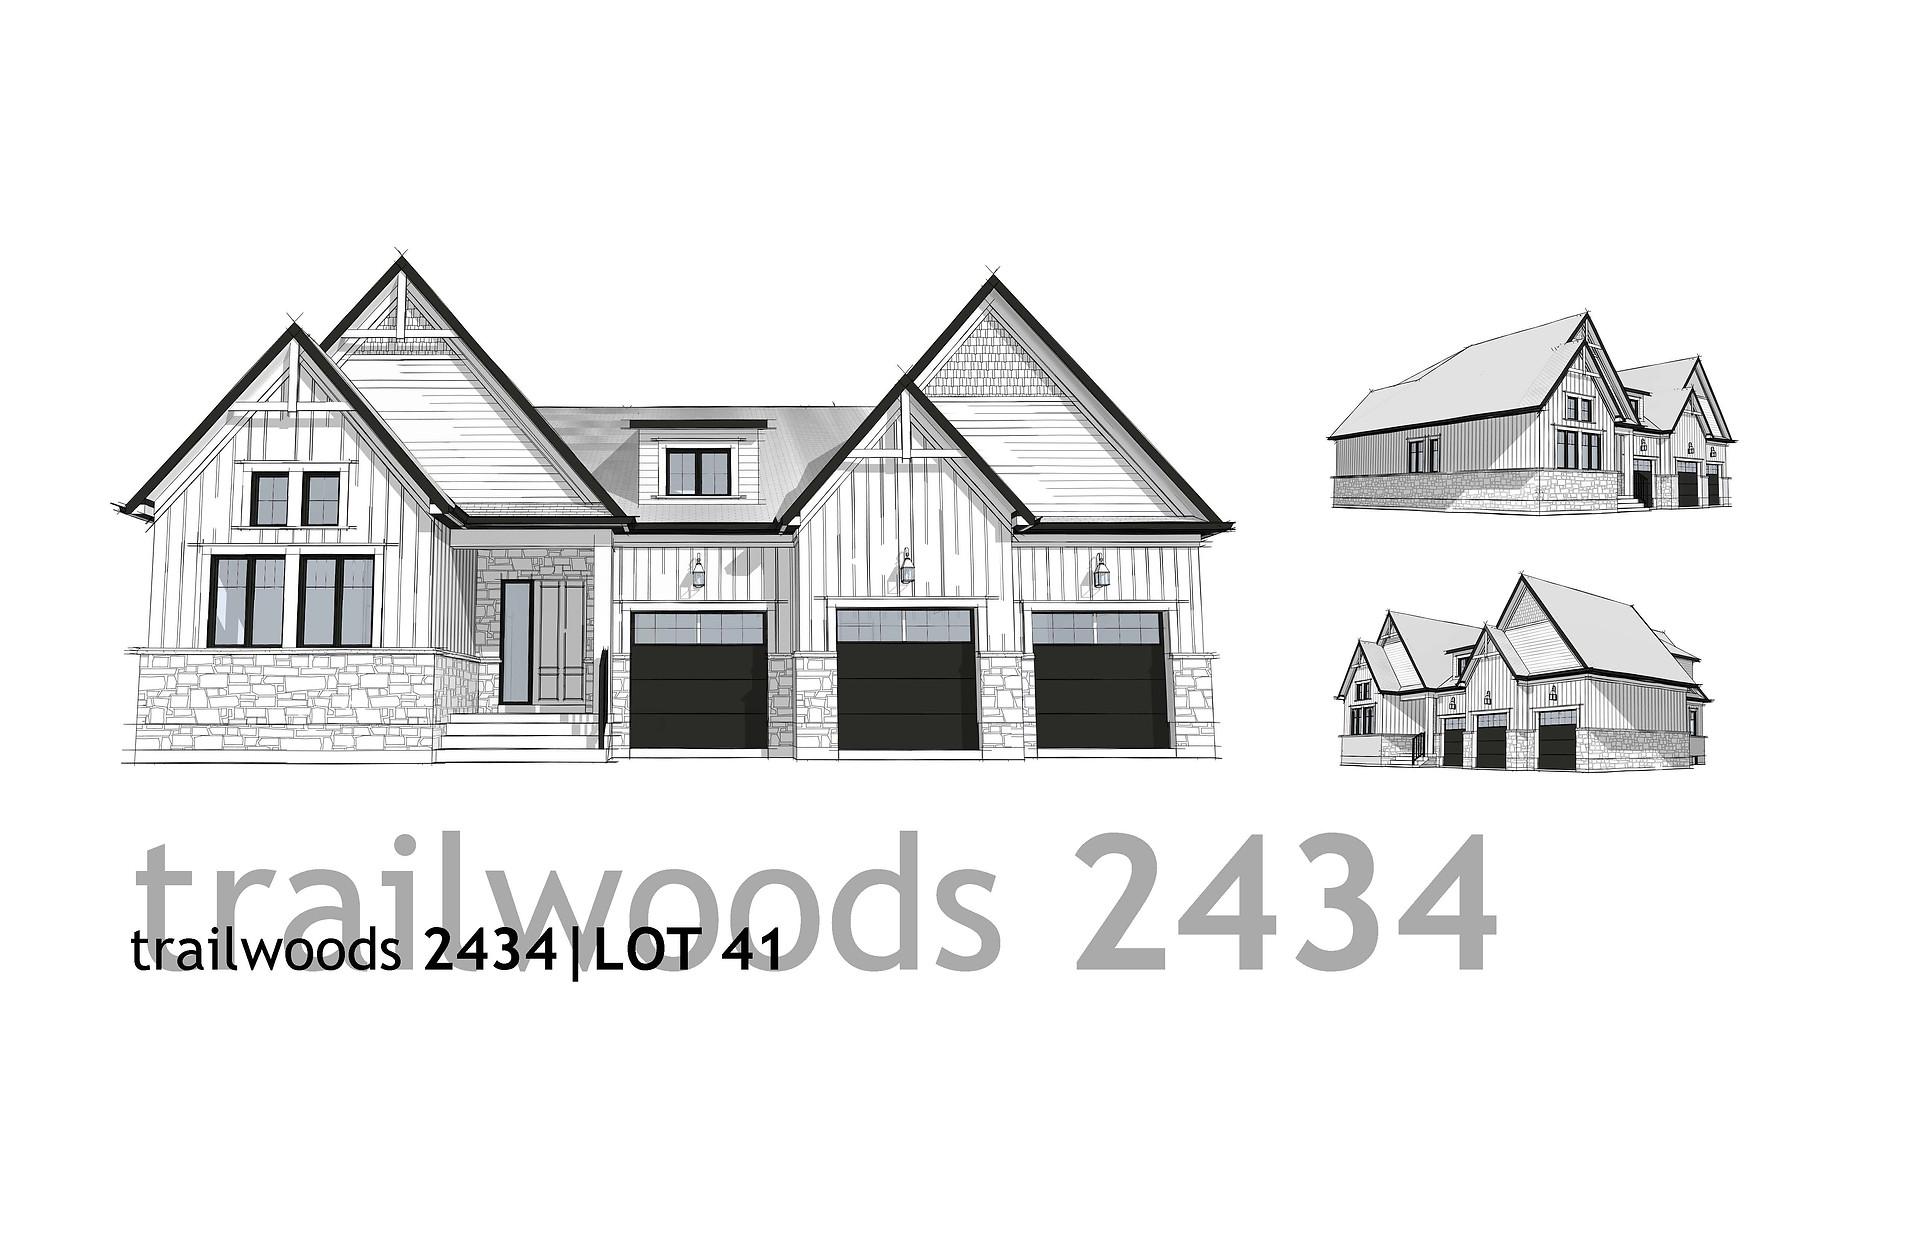 trailwoods 2434